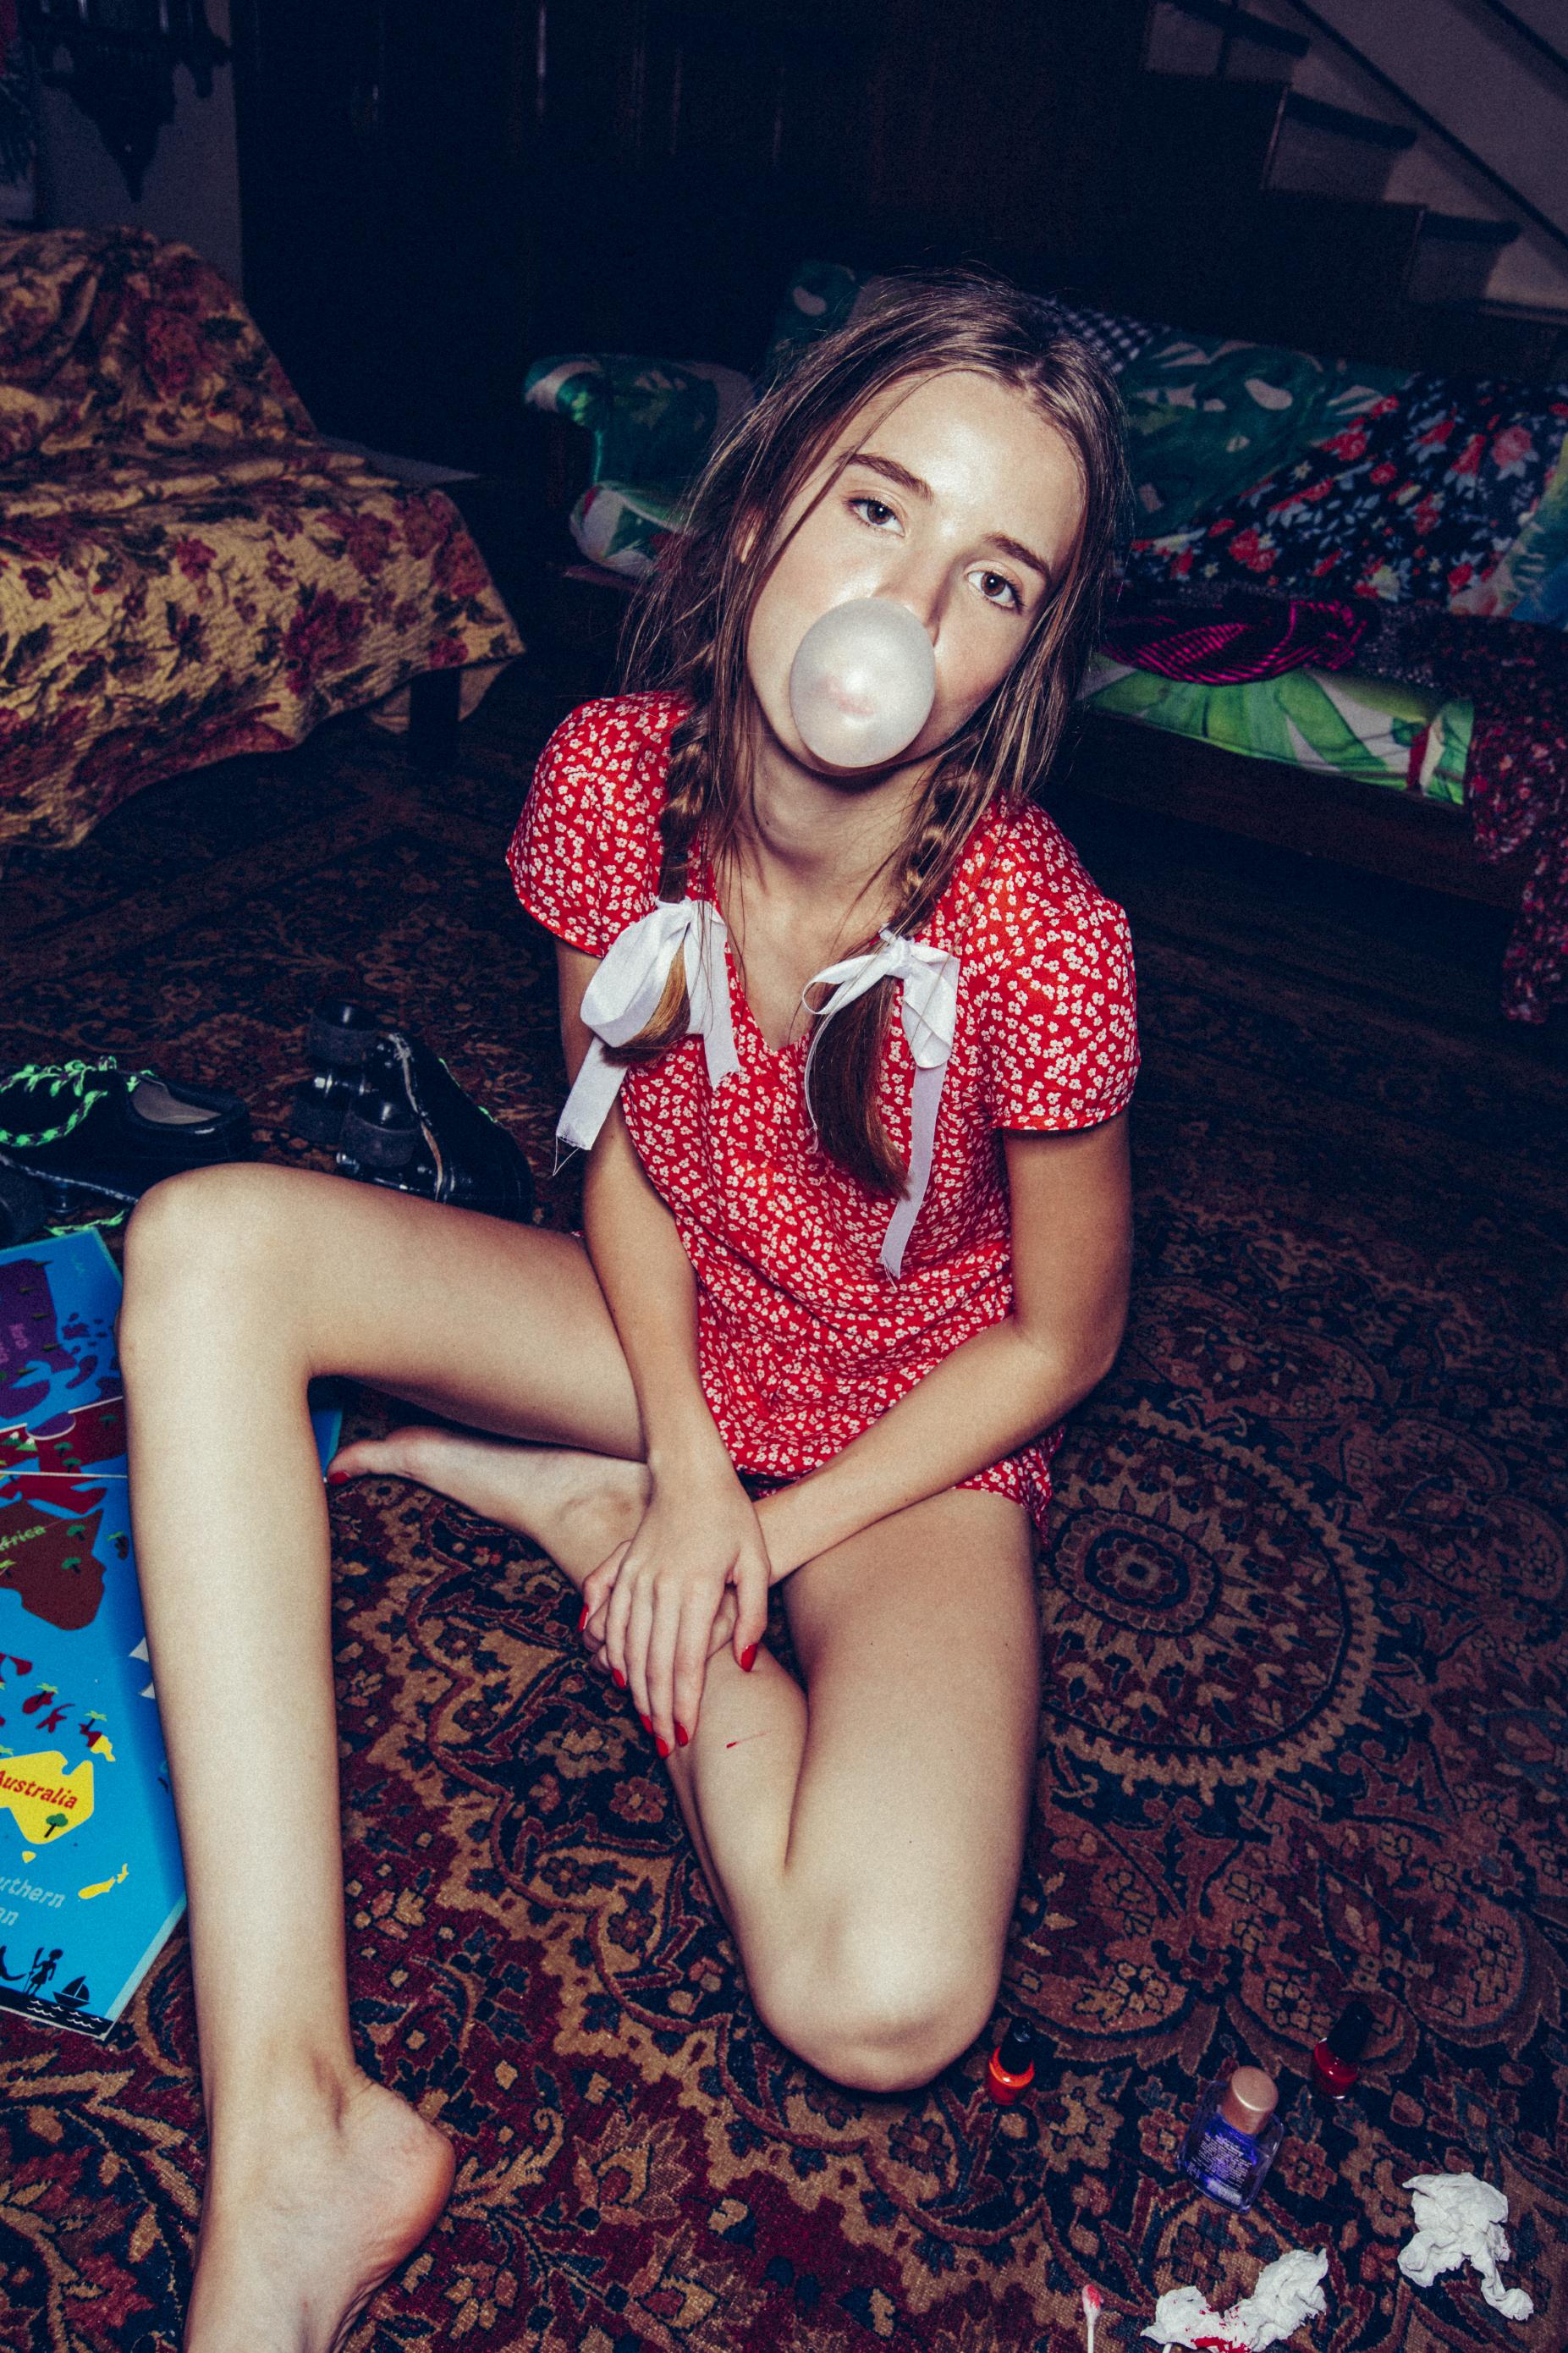 Vikas_Vasudev_Lolita7.jpg